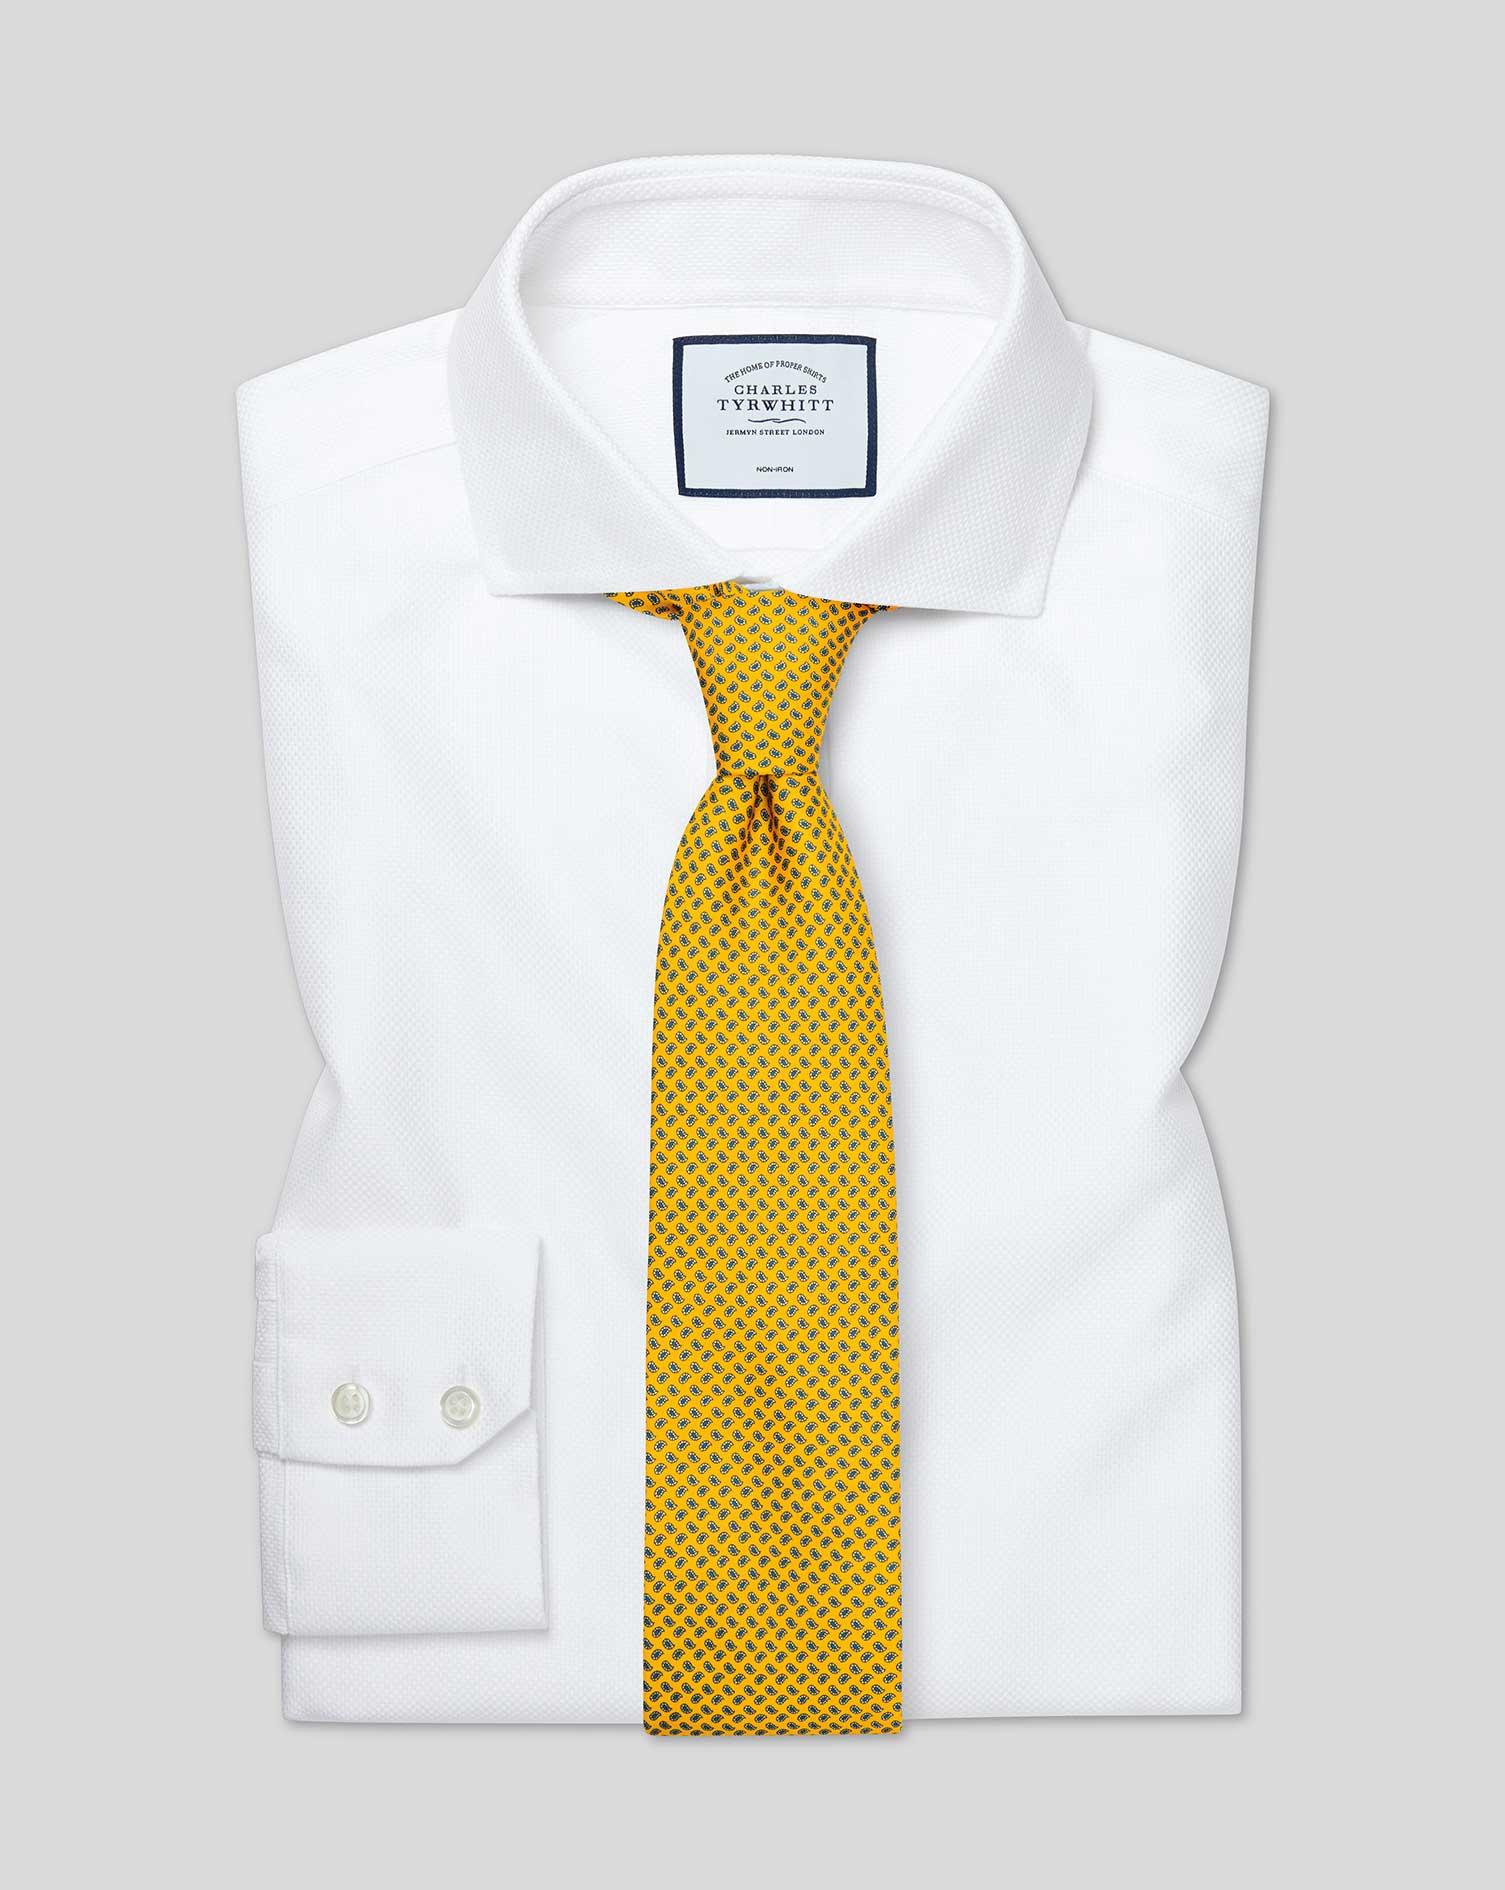 Cotton Slim Fit Cutaway Non-Iron Buckingham Weave White Shirt